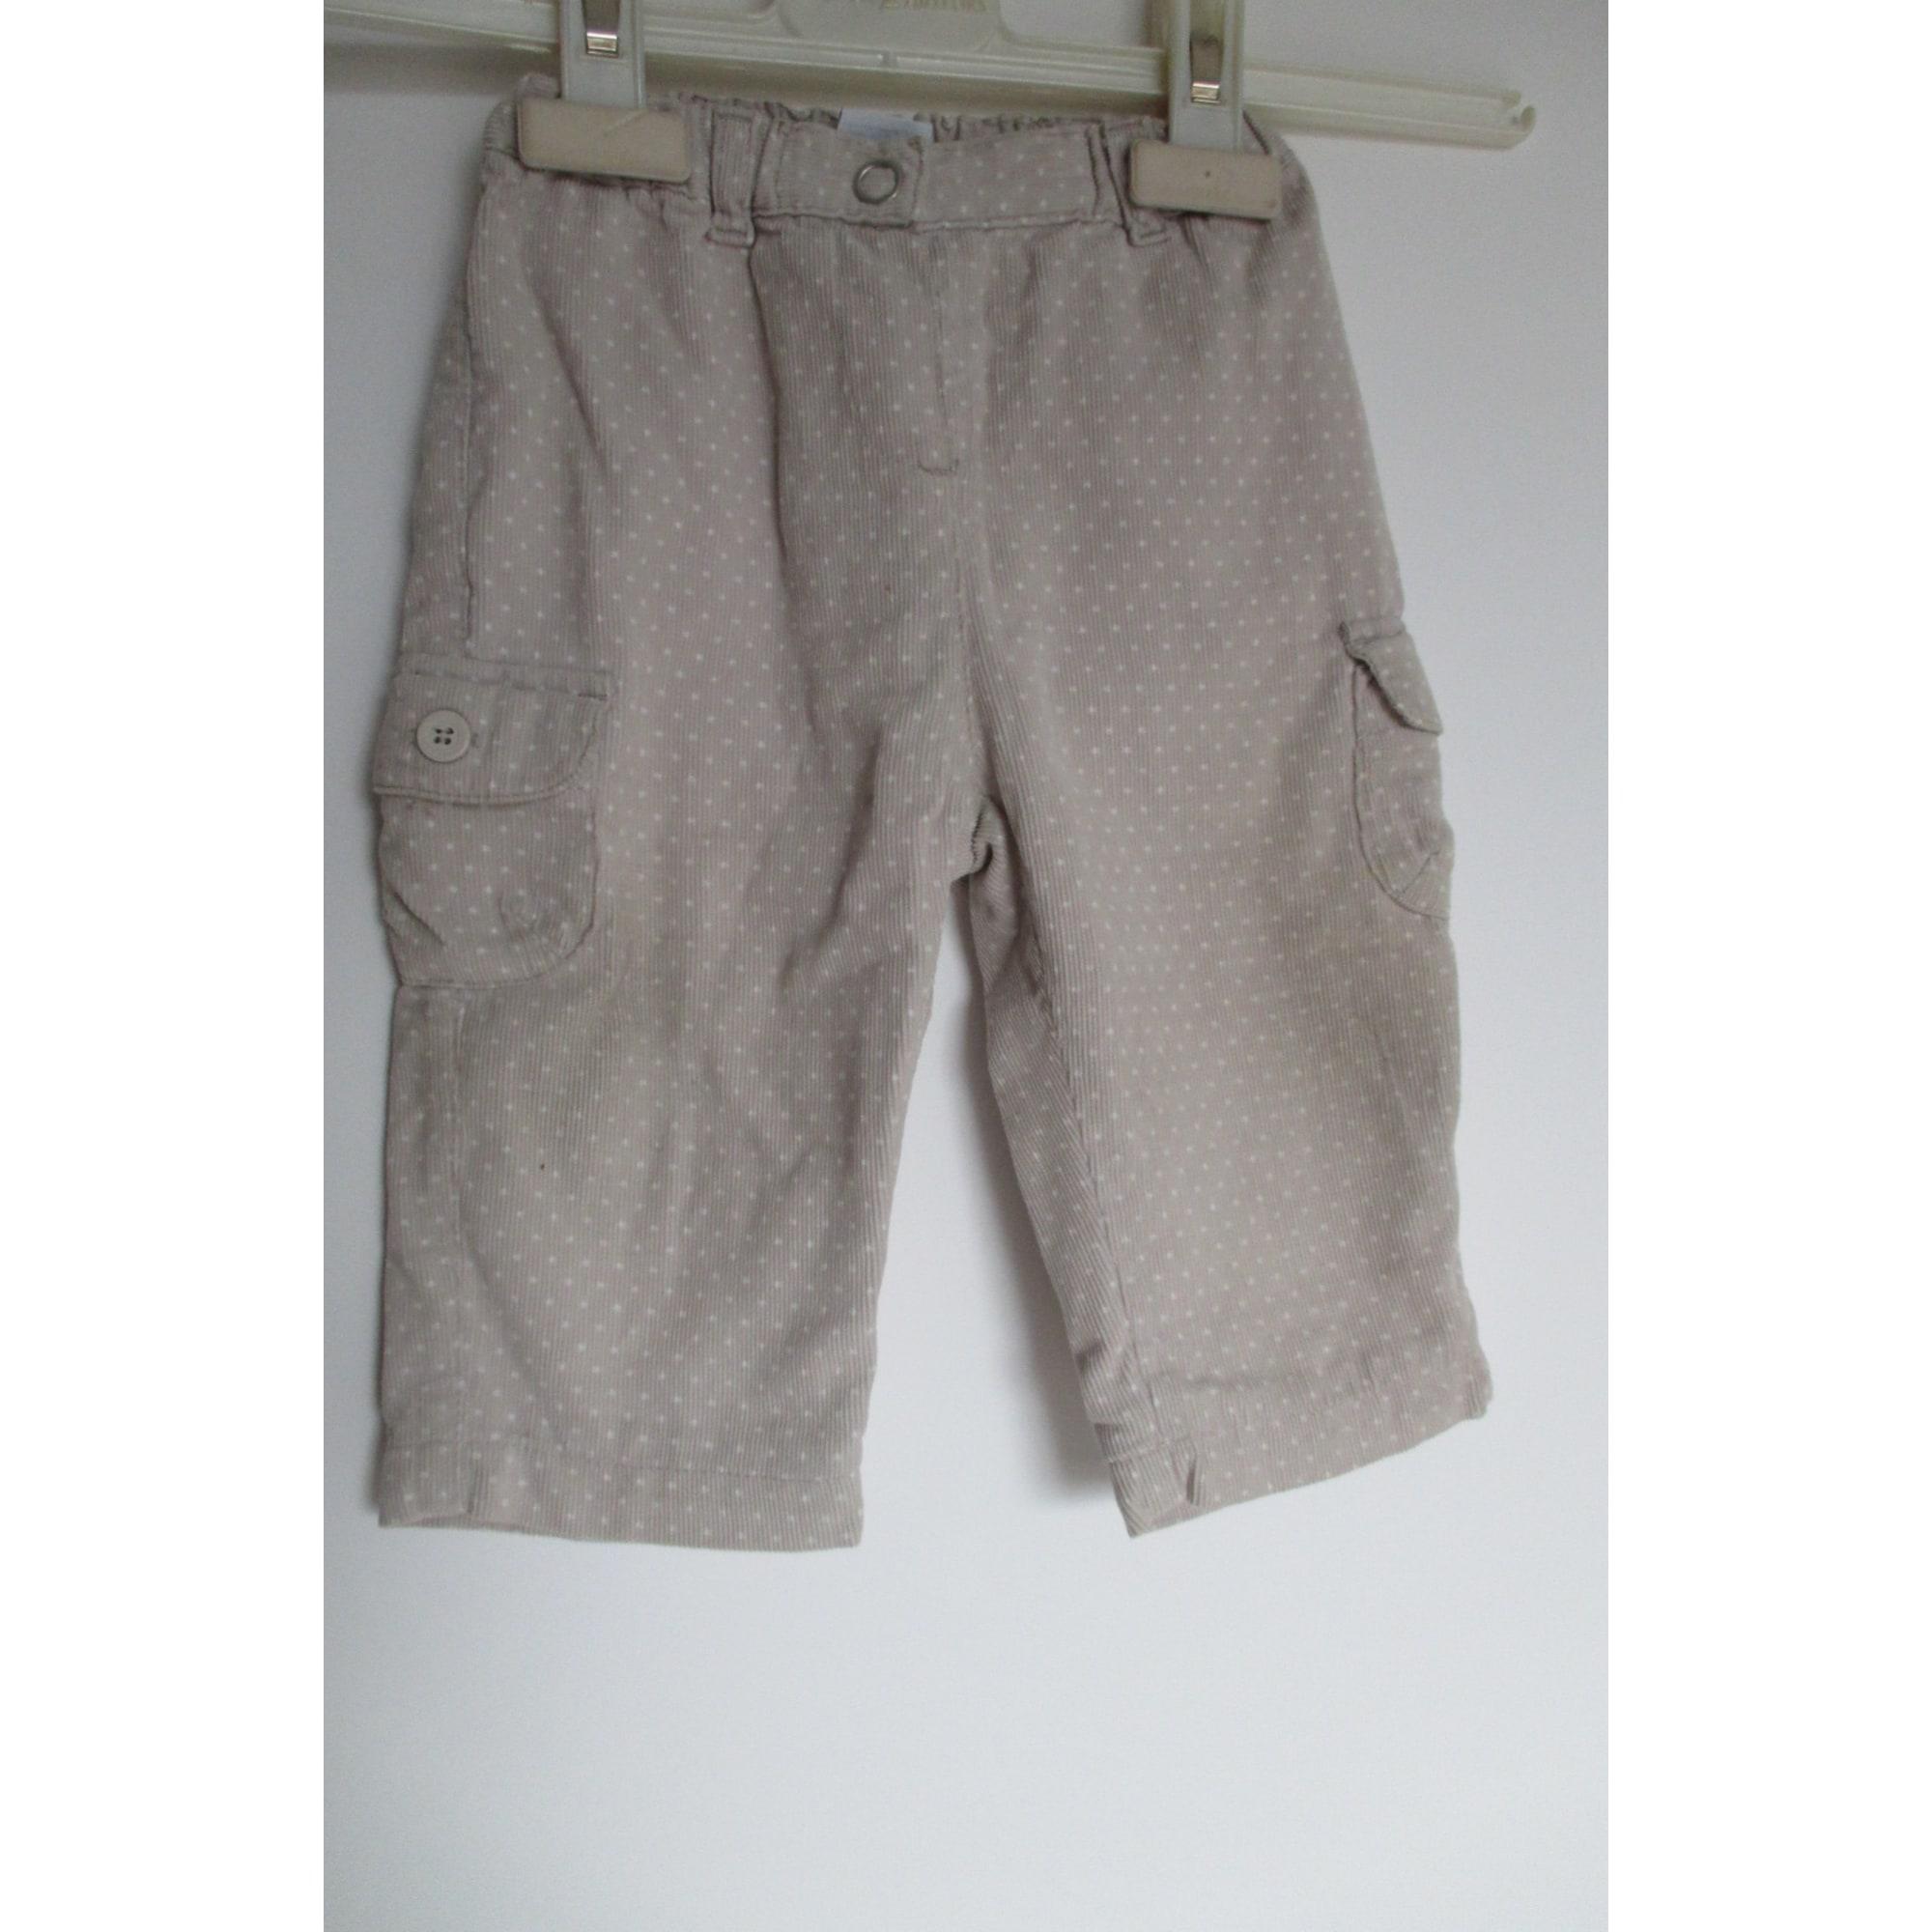 Pantalon PETIT BATEAU Beige, camel